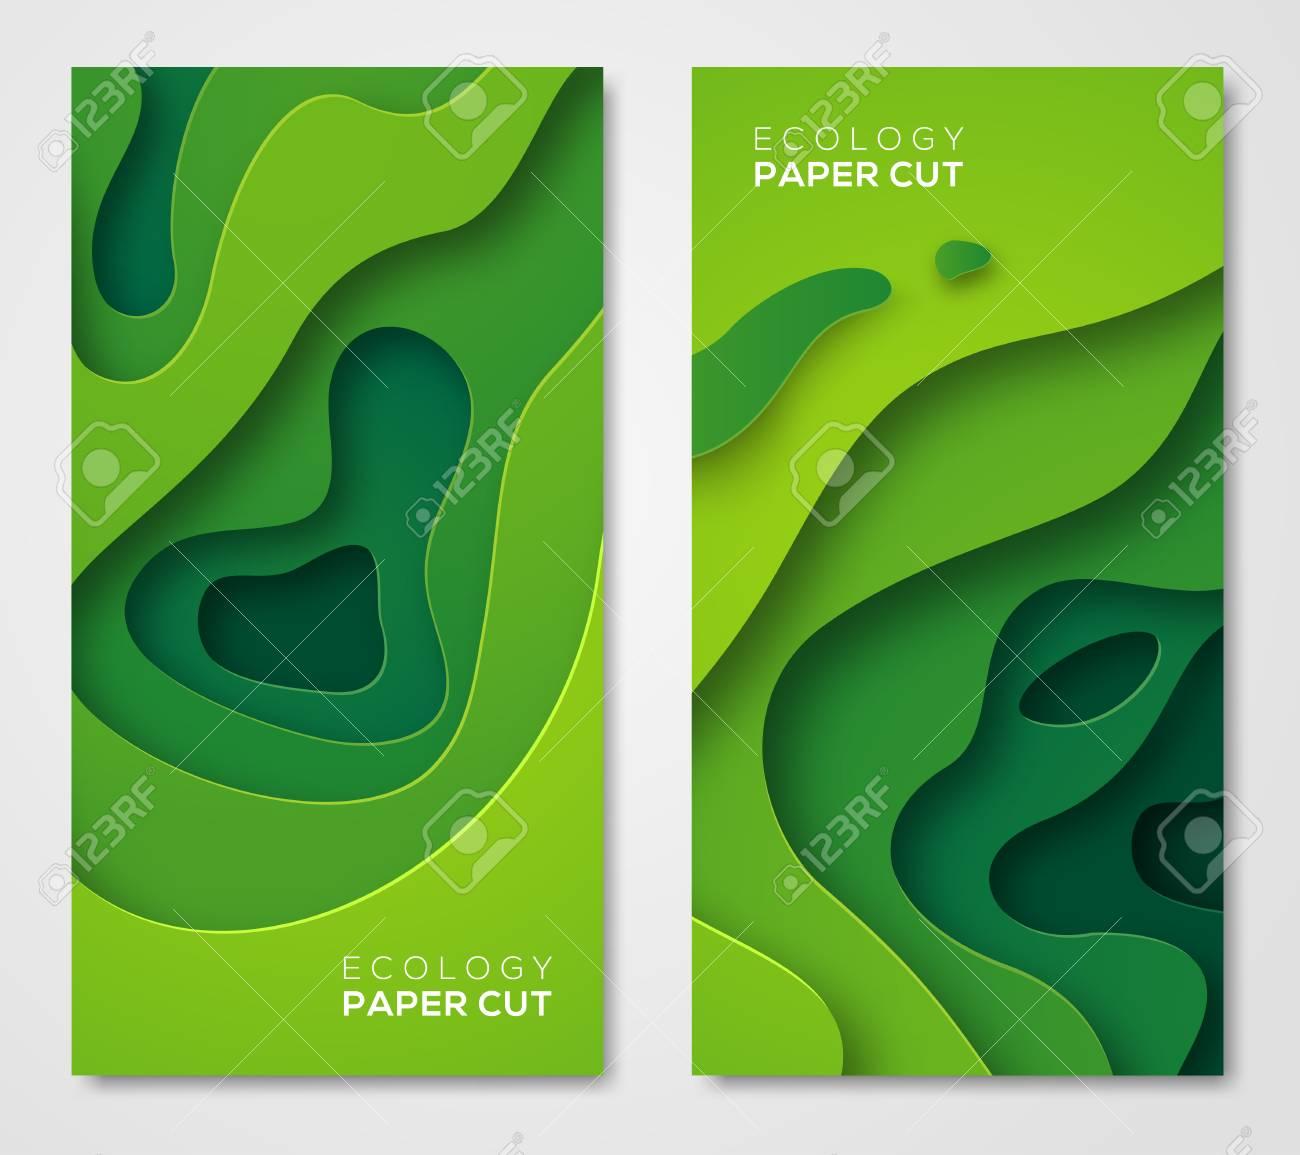 Vertical banners set, green paper cut shapes - 88535921